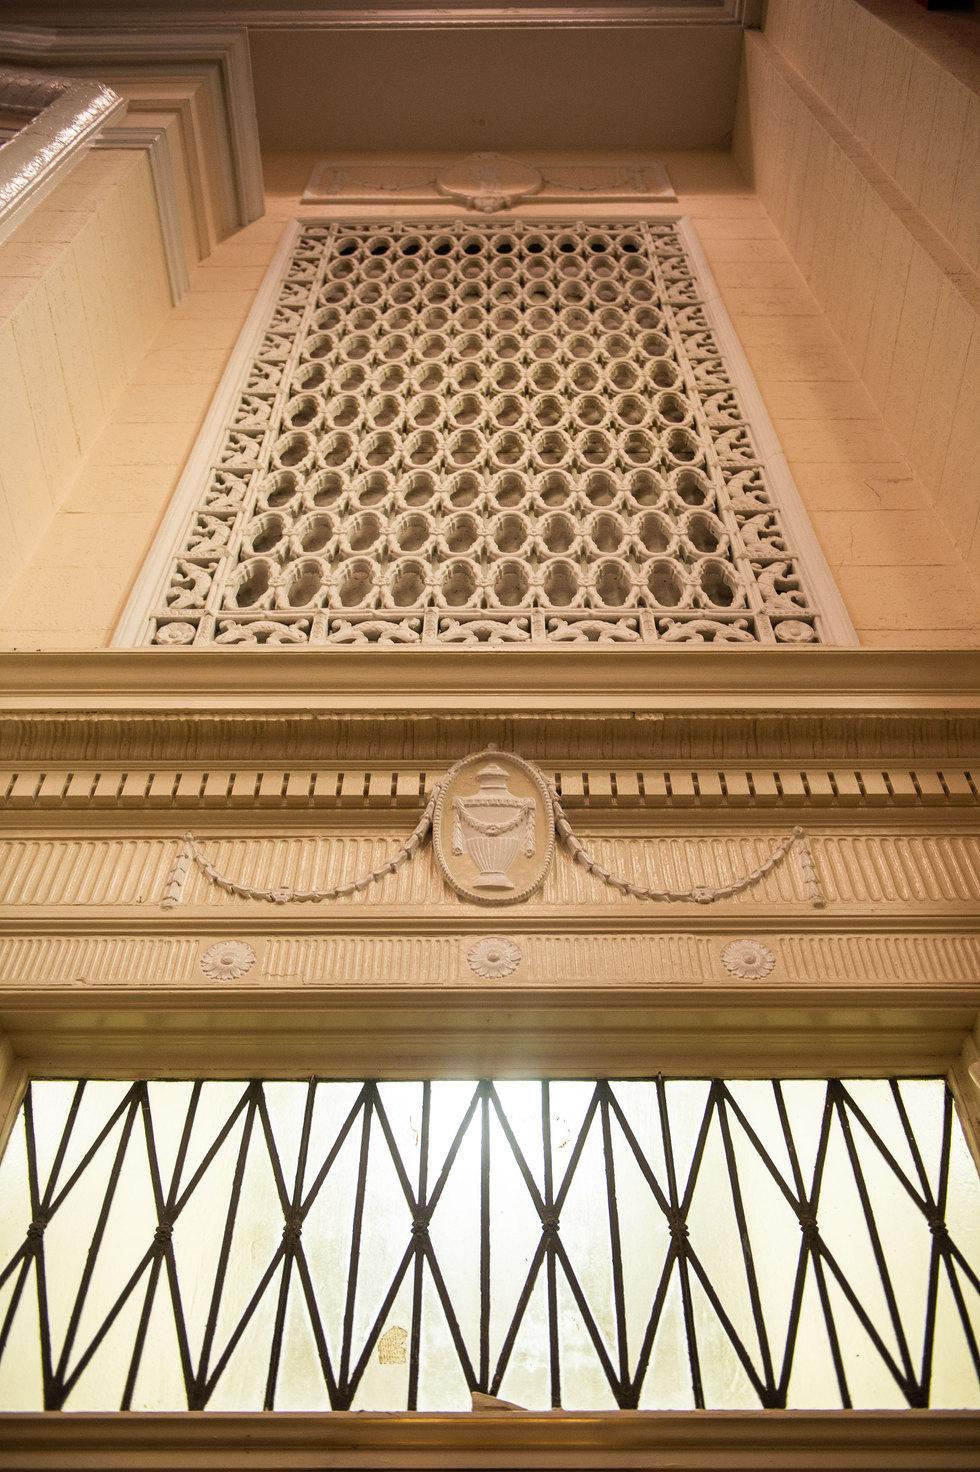 Penn Treaty School Iron Detail